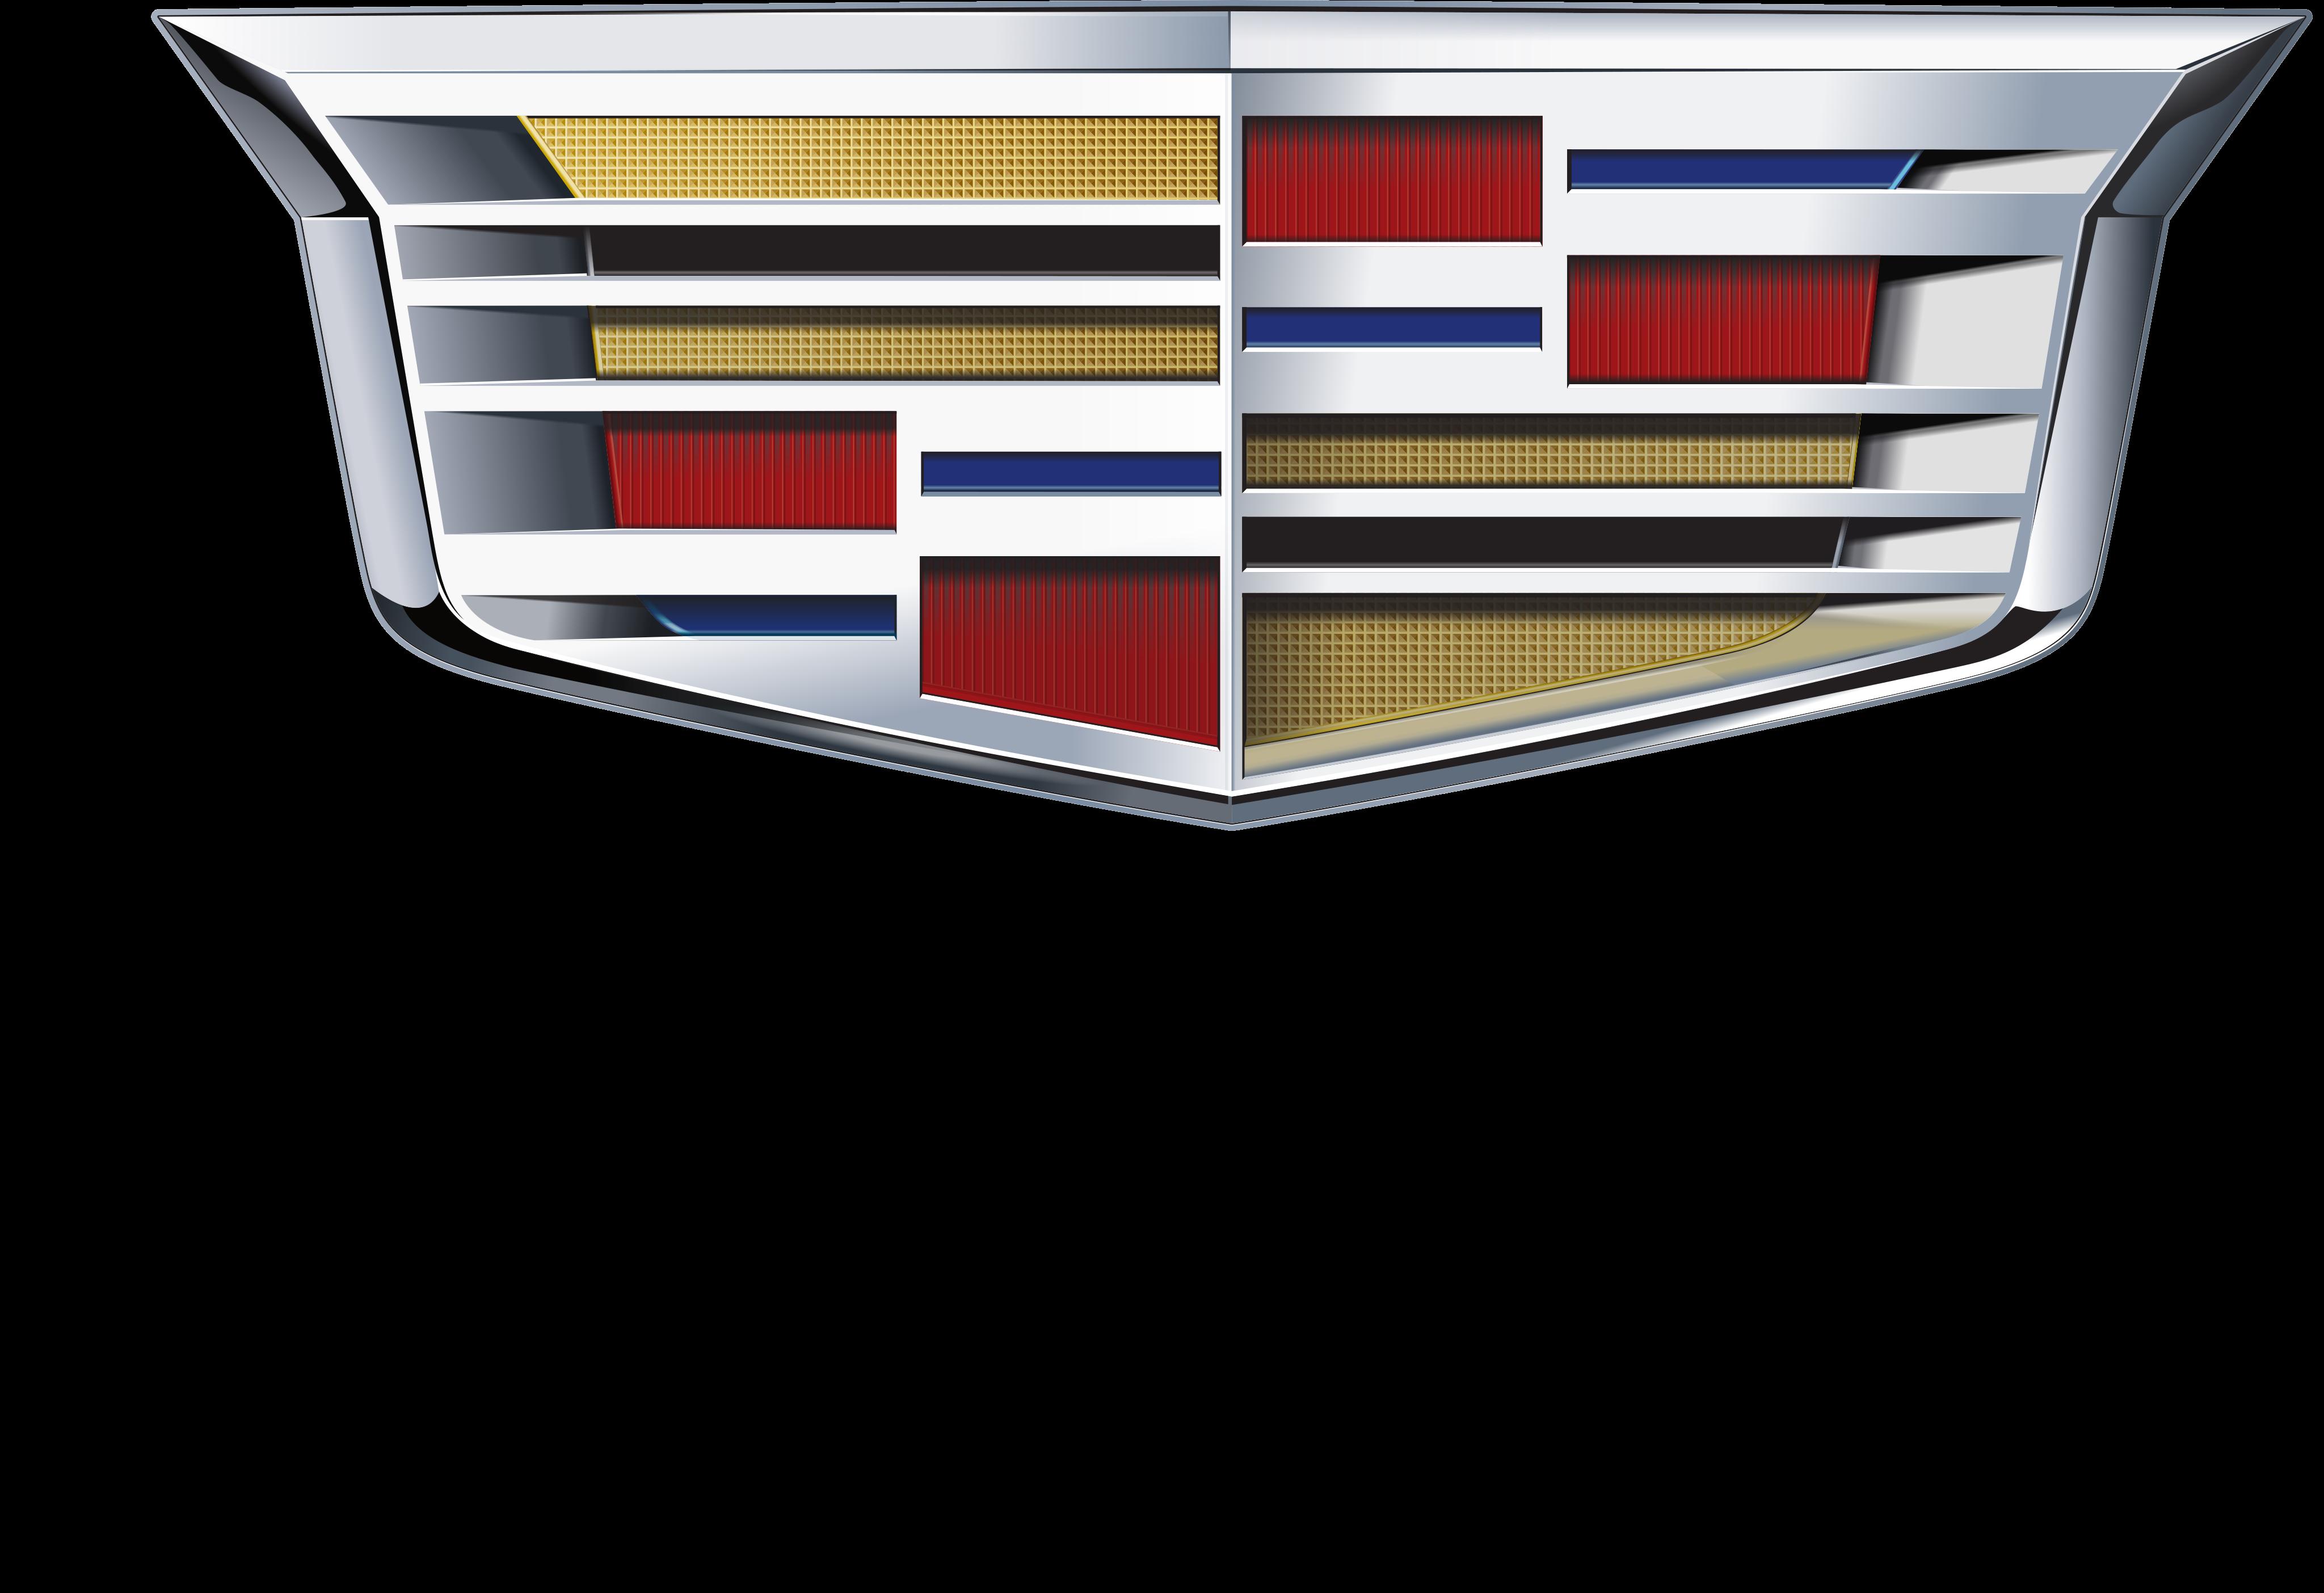 cadillac logo 1 - Cadillac Logo